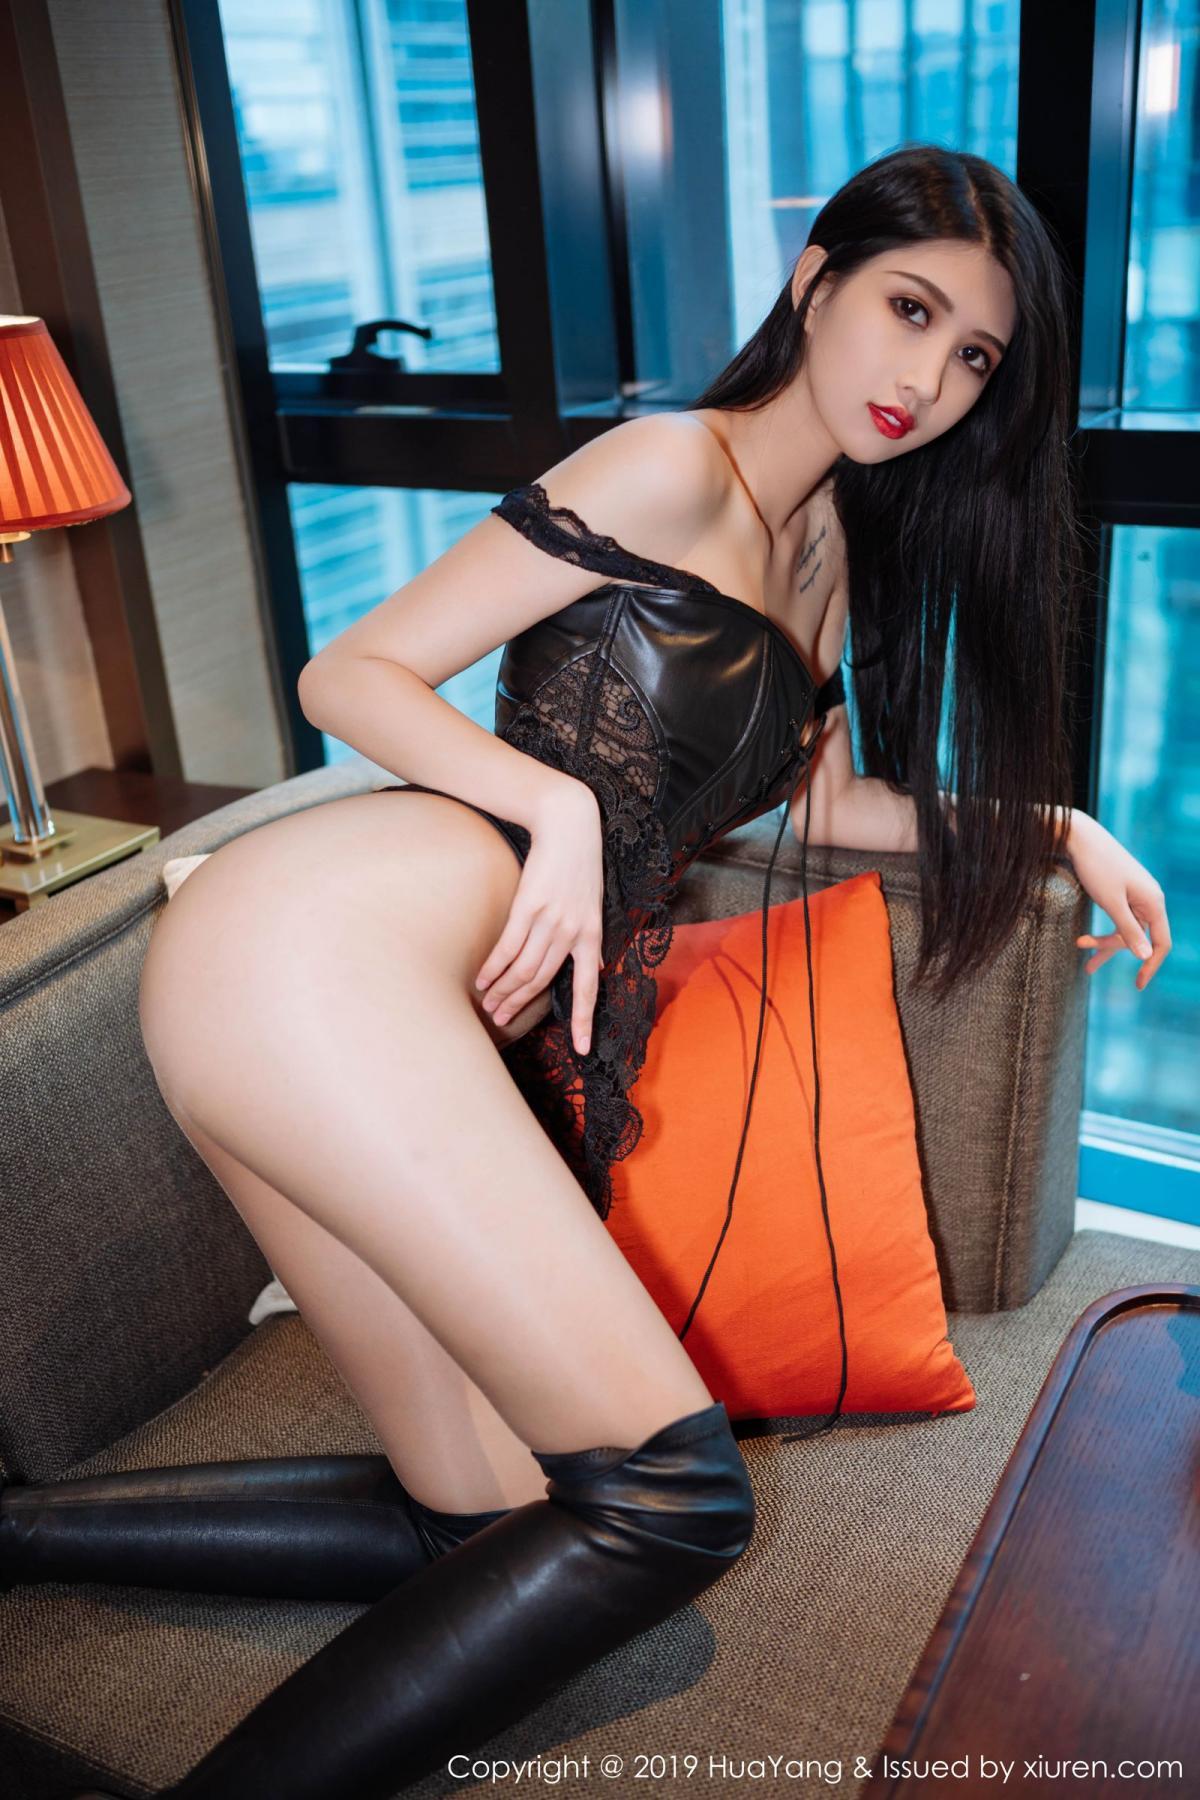 [Huayang] Vol.194 Ge Zheng 5P, Ha Ni Bao Bao, HuaYang, Tall, Underwear